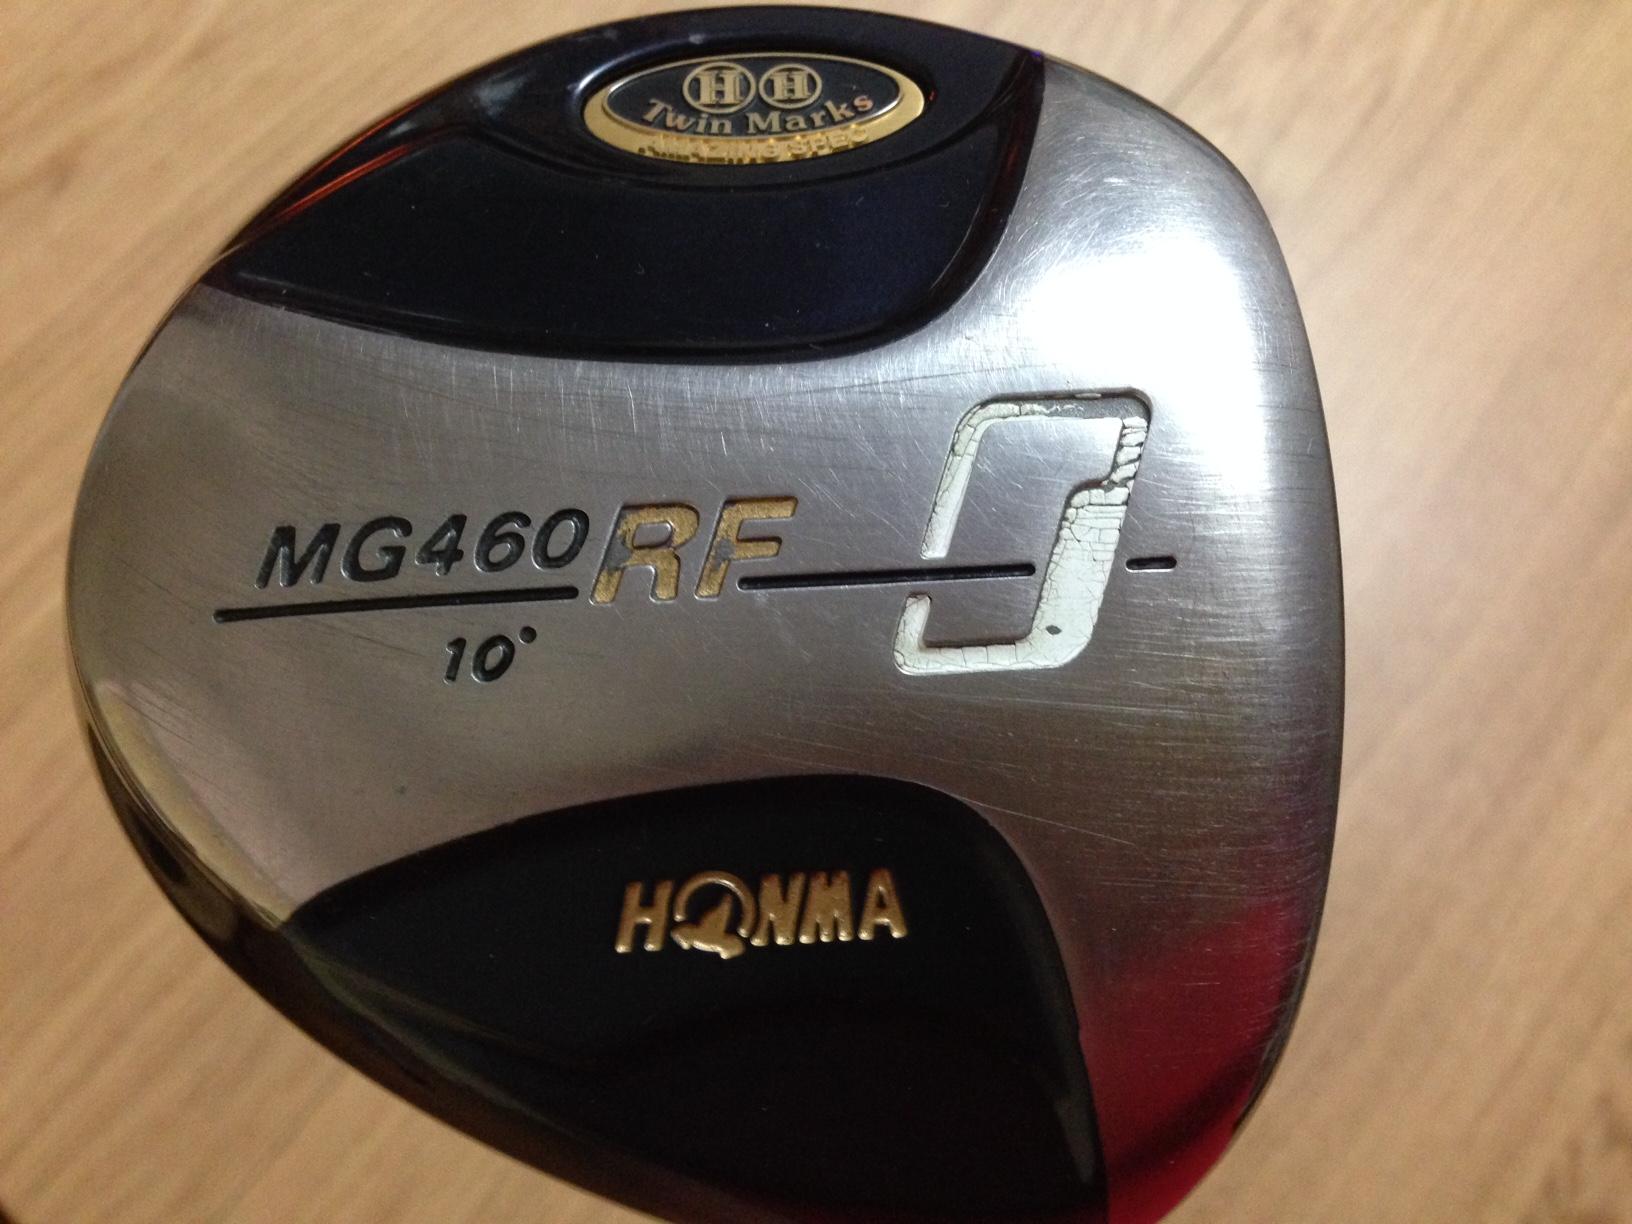 HONMA製 Twin Marks MG460 RF10° ARMRQ 851(R) 3スター